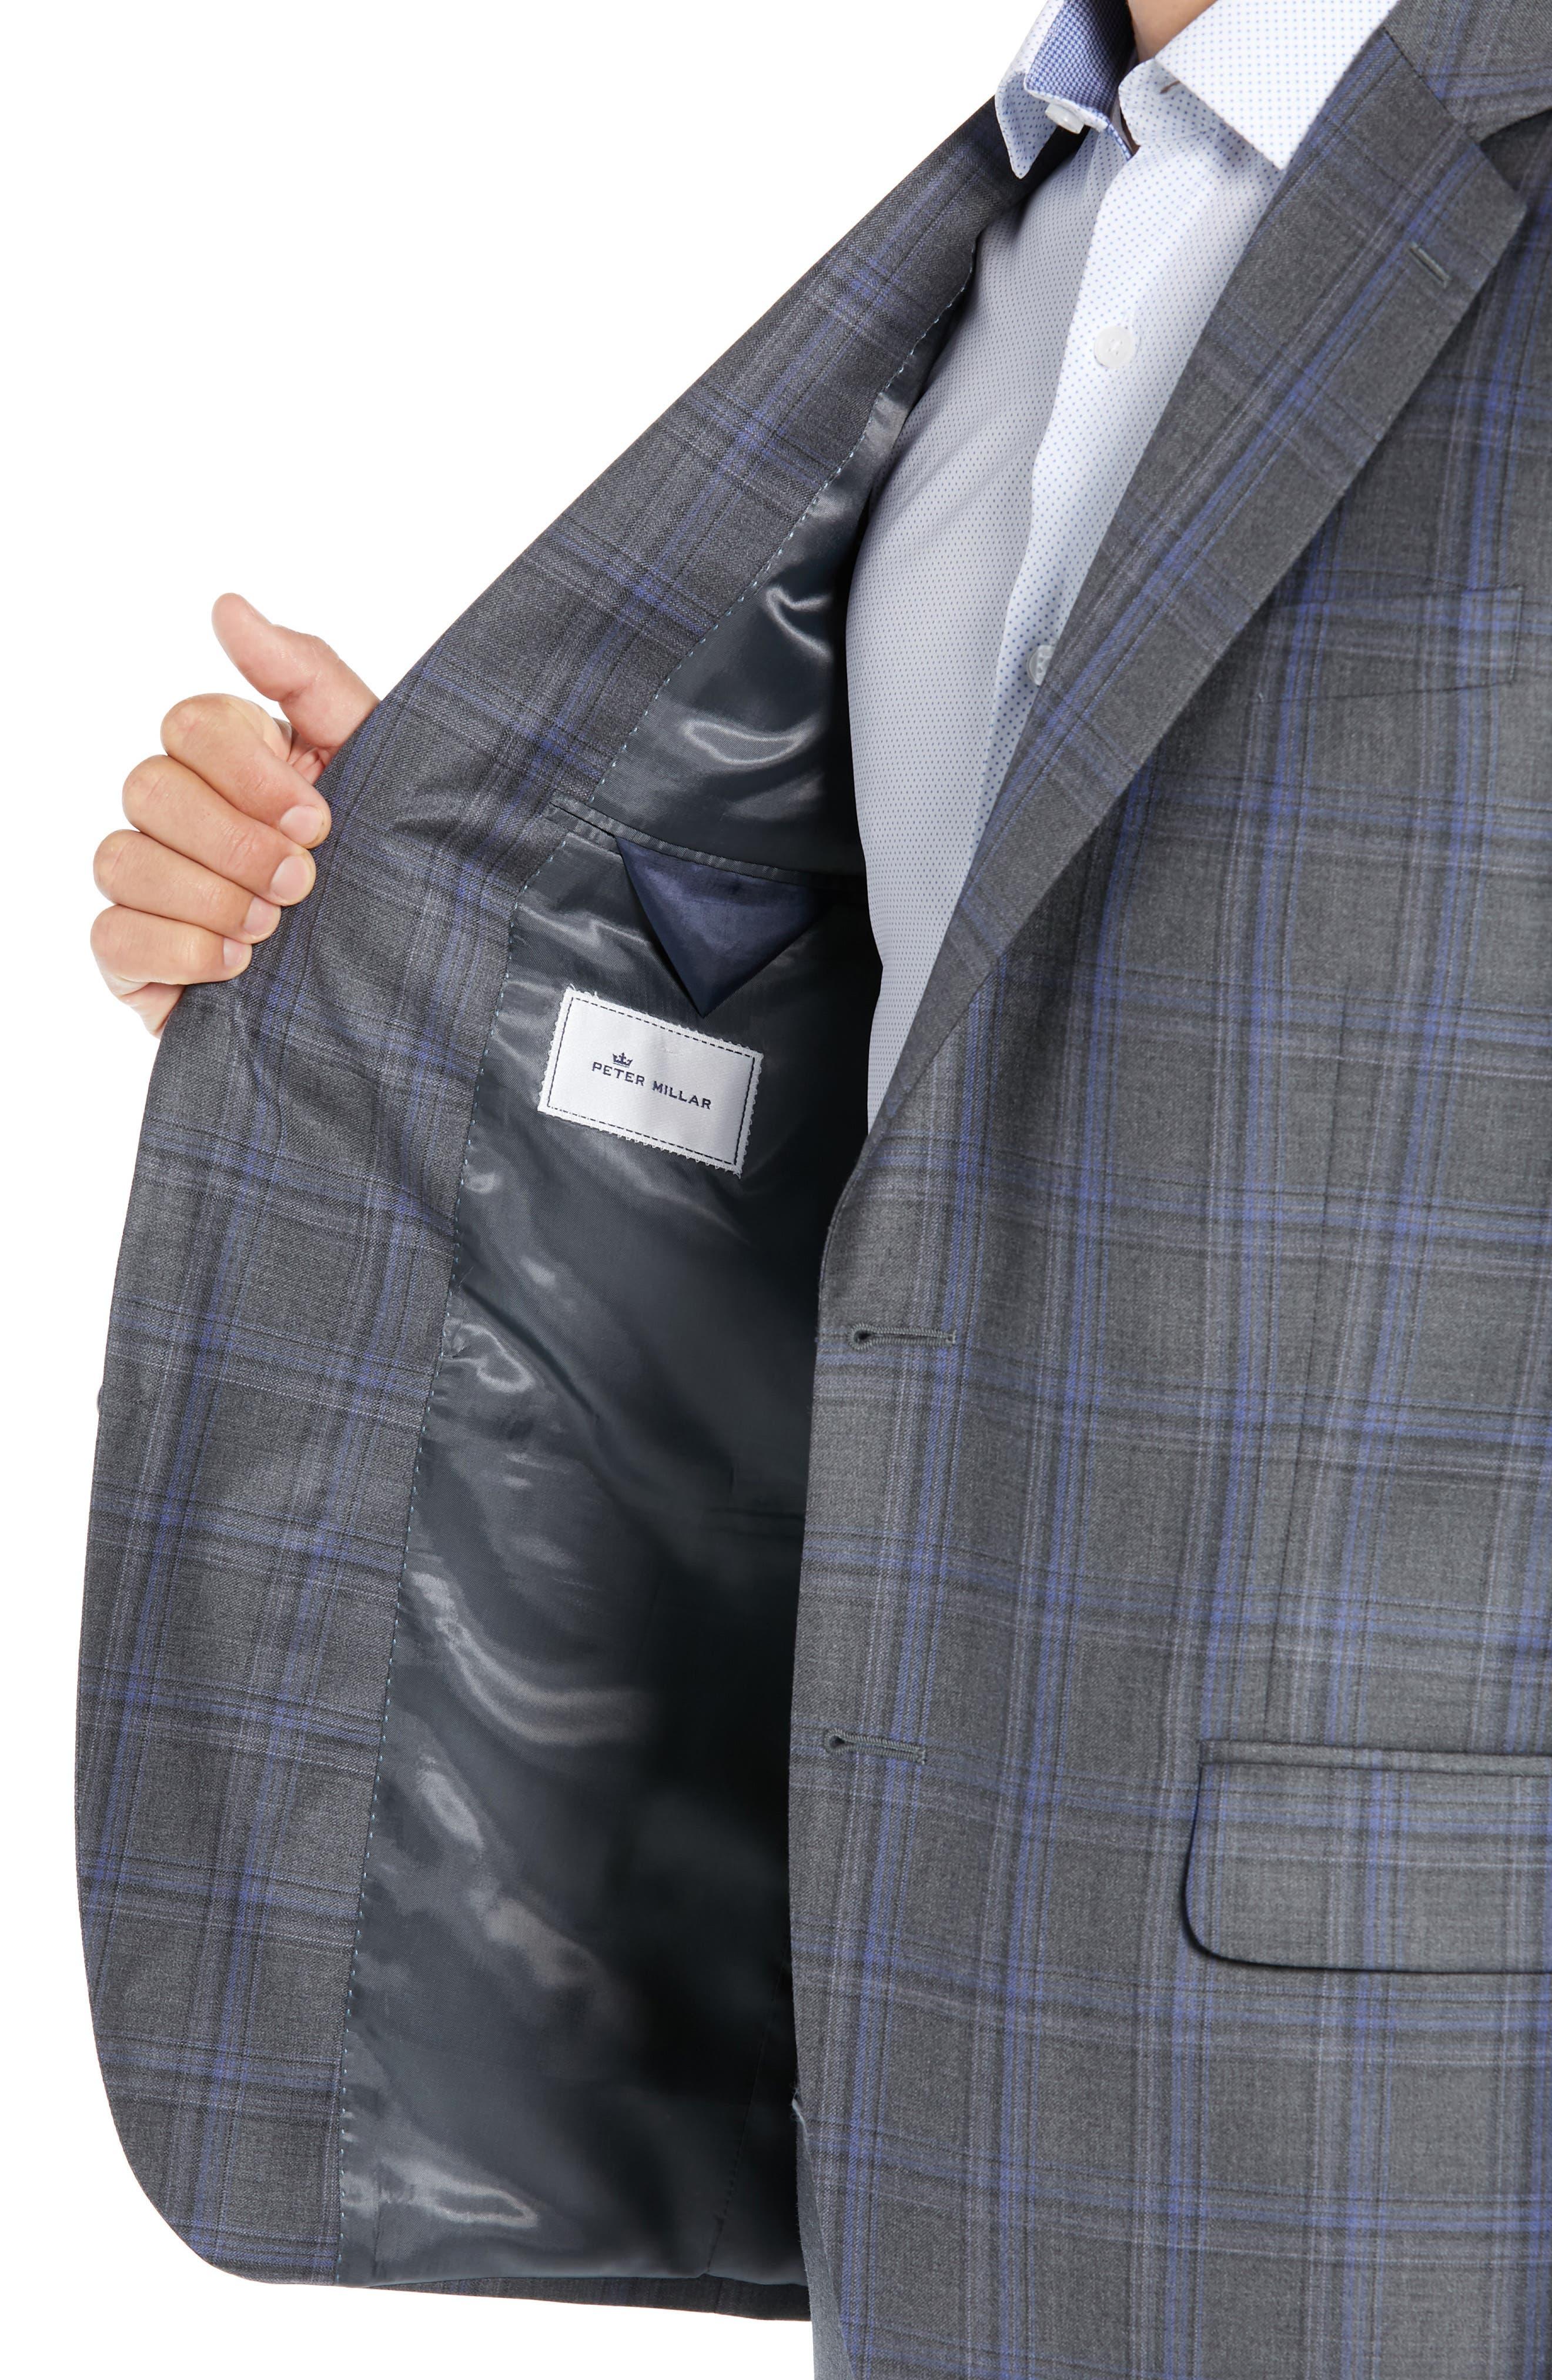 PETER MILLAR, Classic Fit Grey Plaid Sport Coat, Alternate thumbnail 4, color, GREY